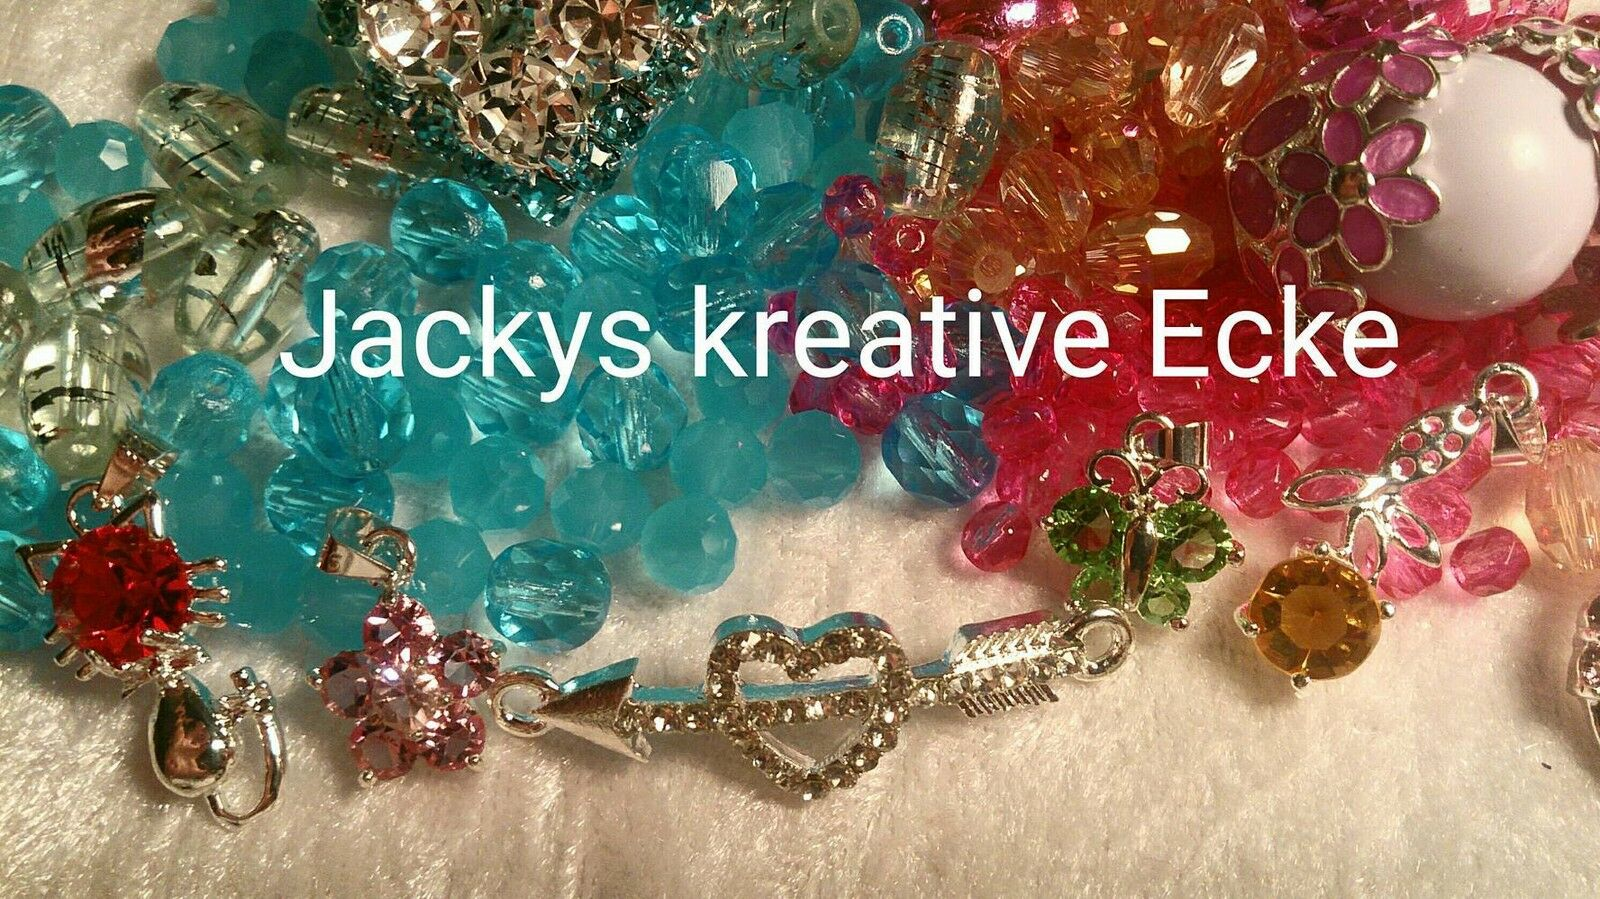 Jackys-kreative-Ecke